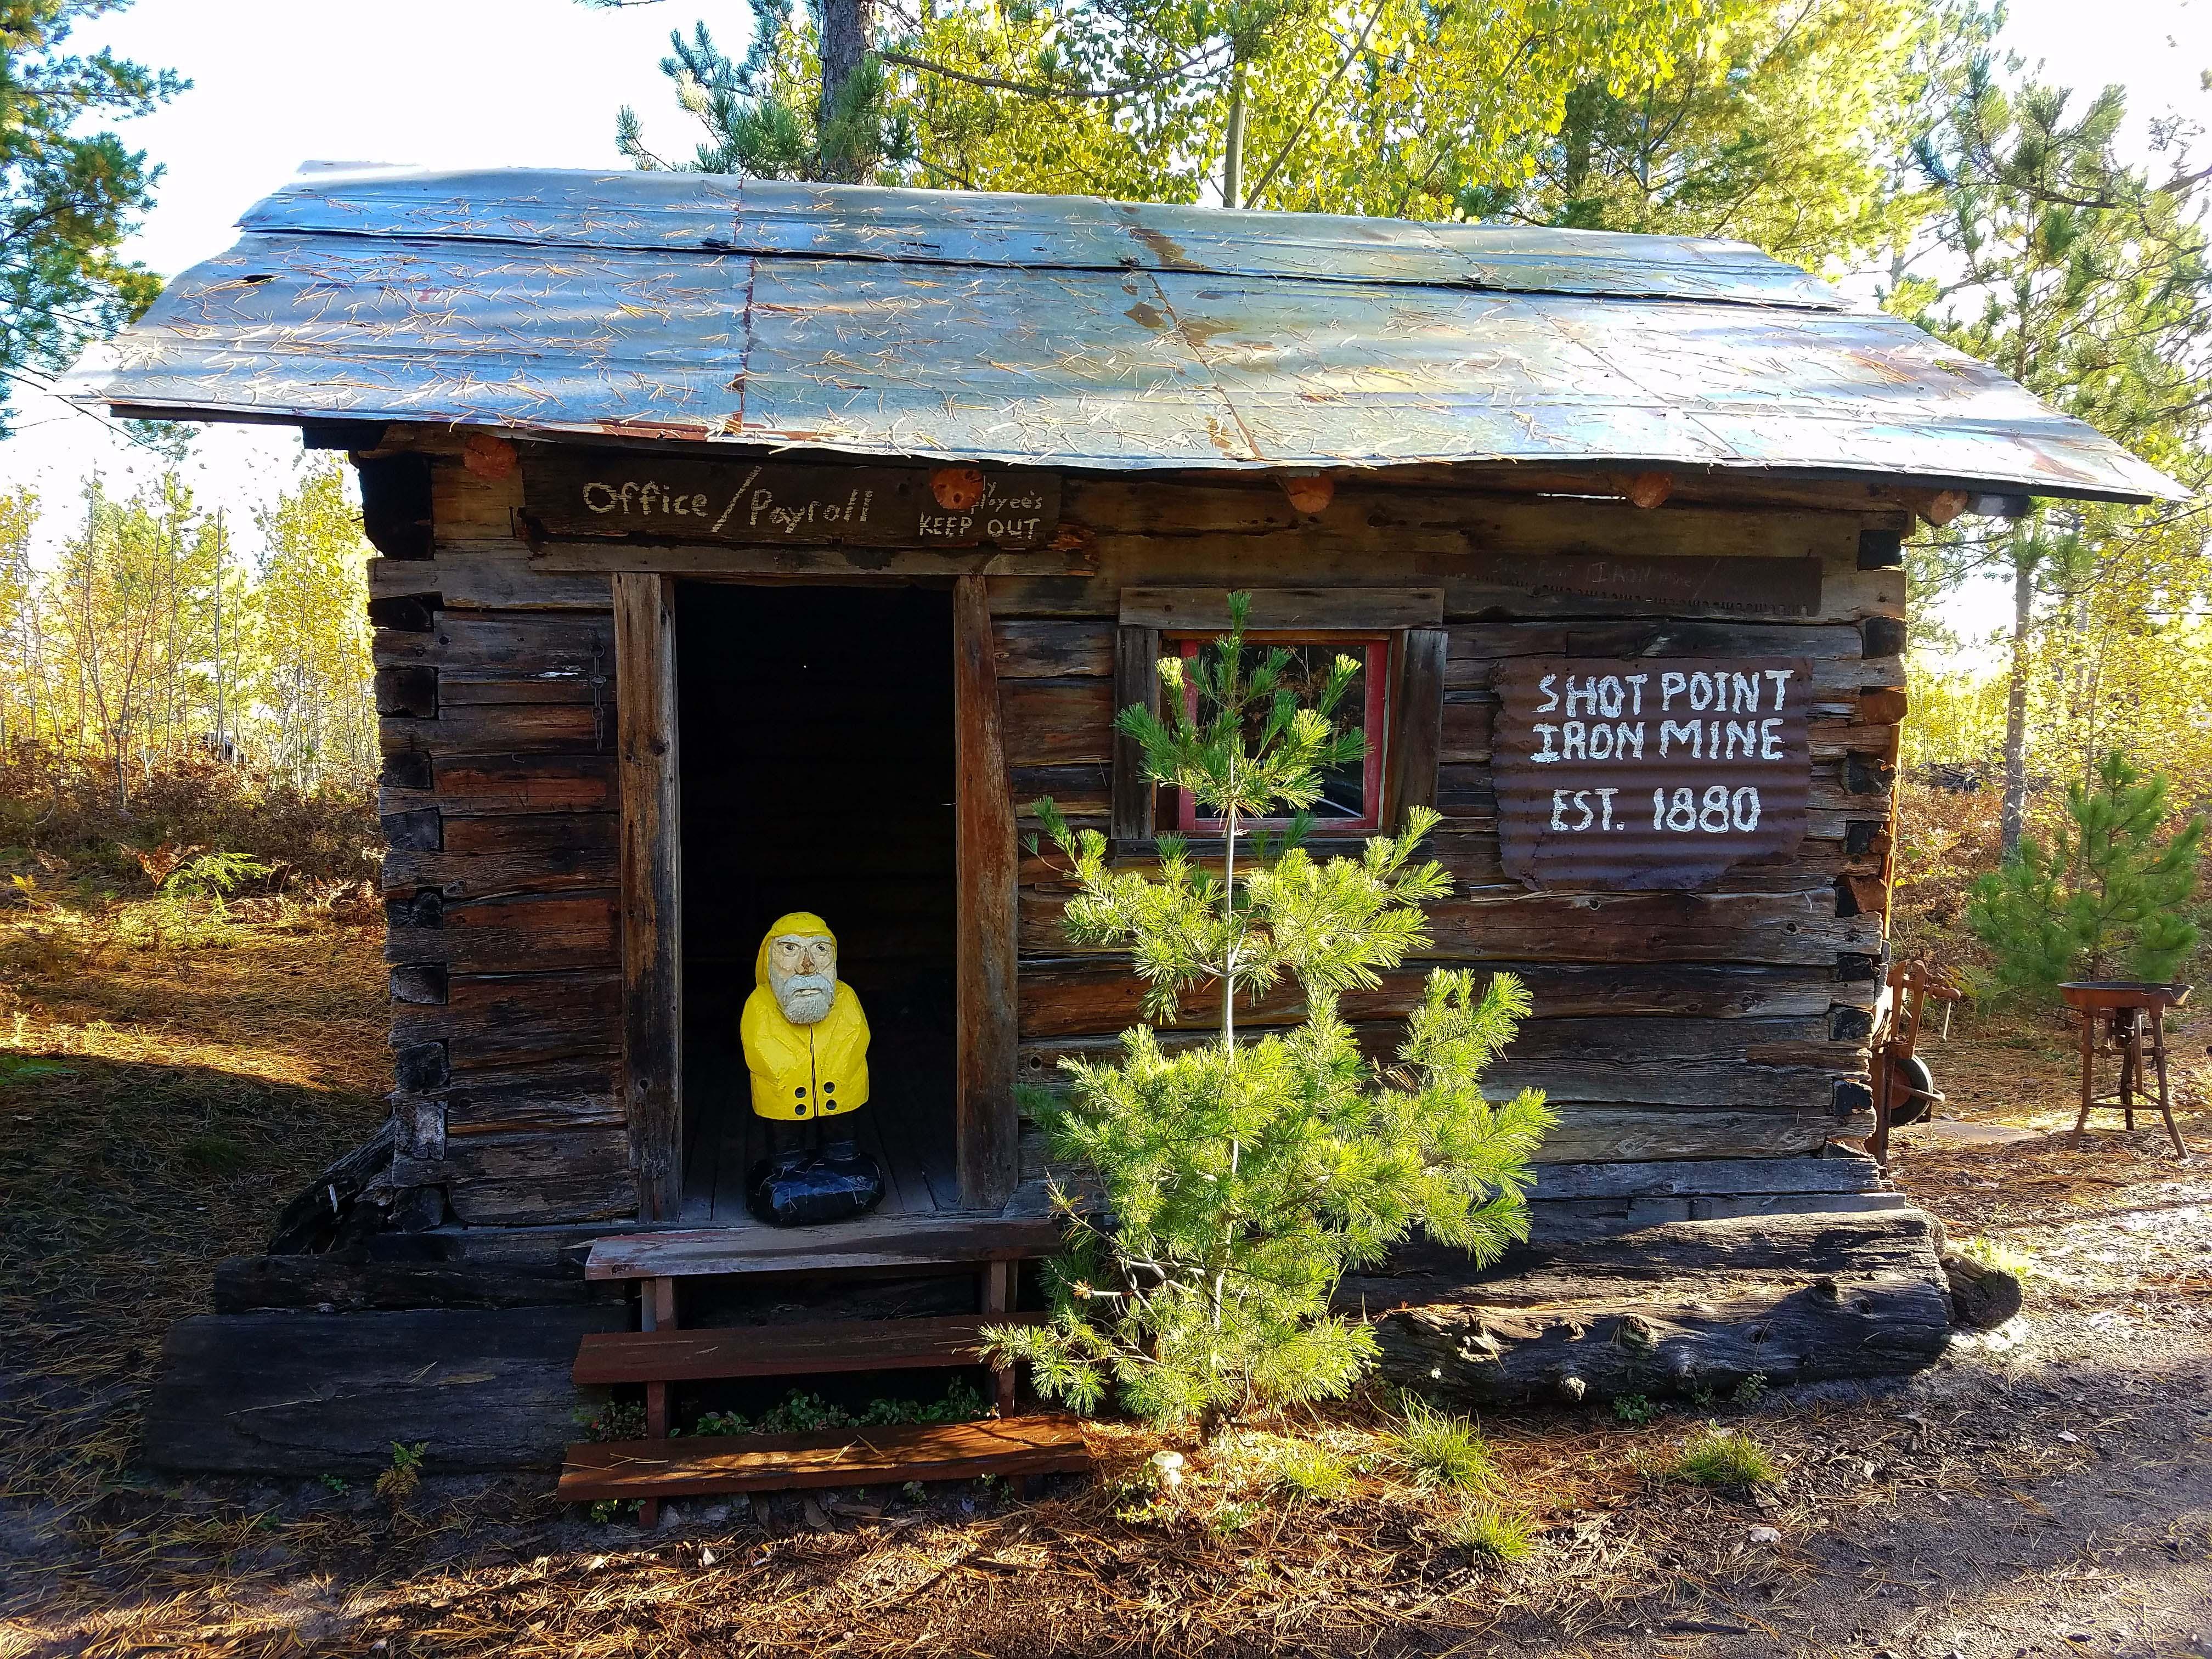 Lakenenland Sculpture Park Michigan 2016 - Ahab's Adventures